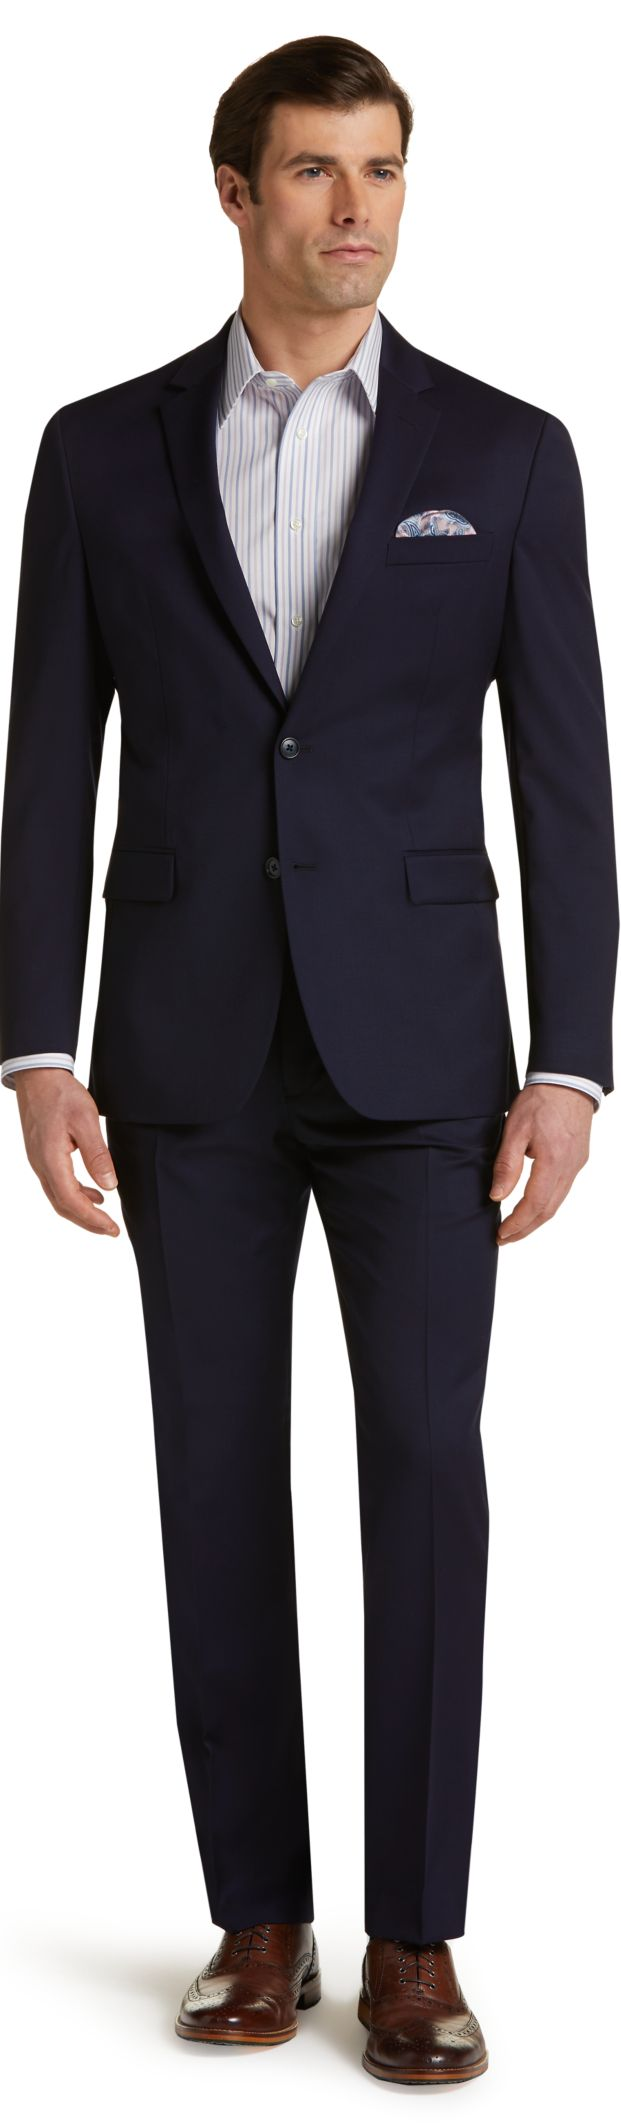 Executive Collection Slim Fit Suit (various colors)